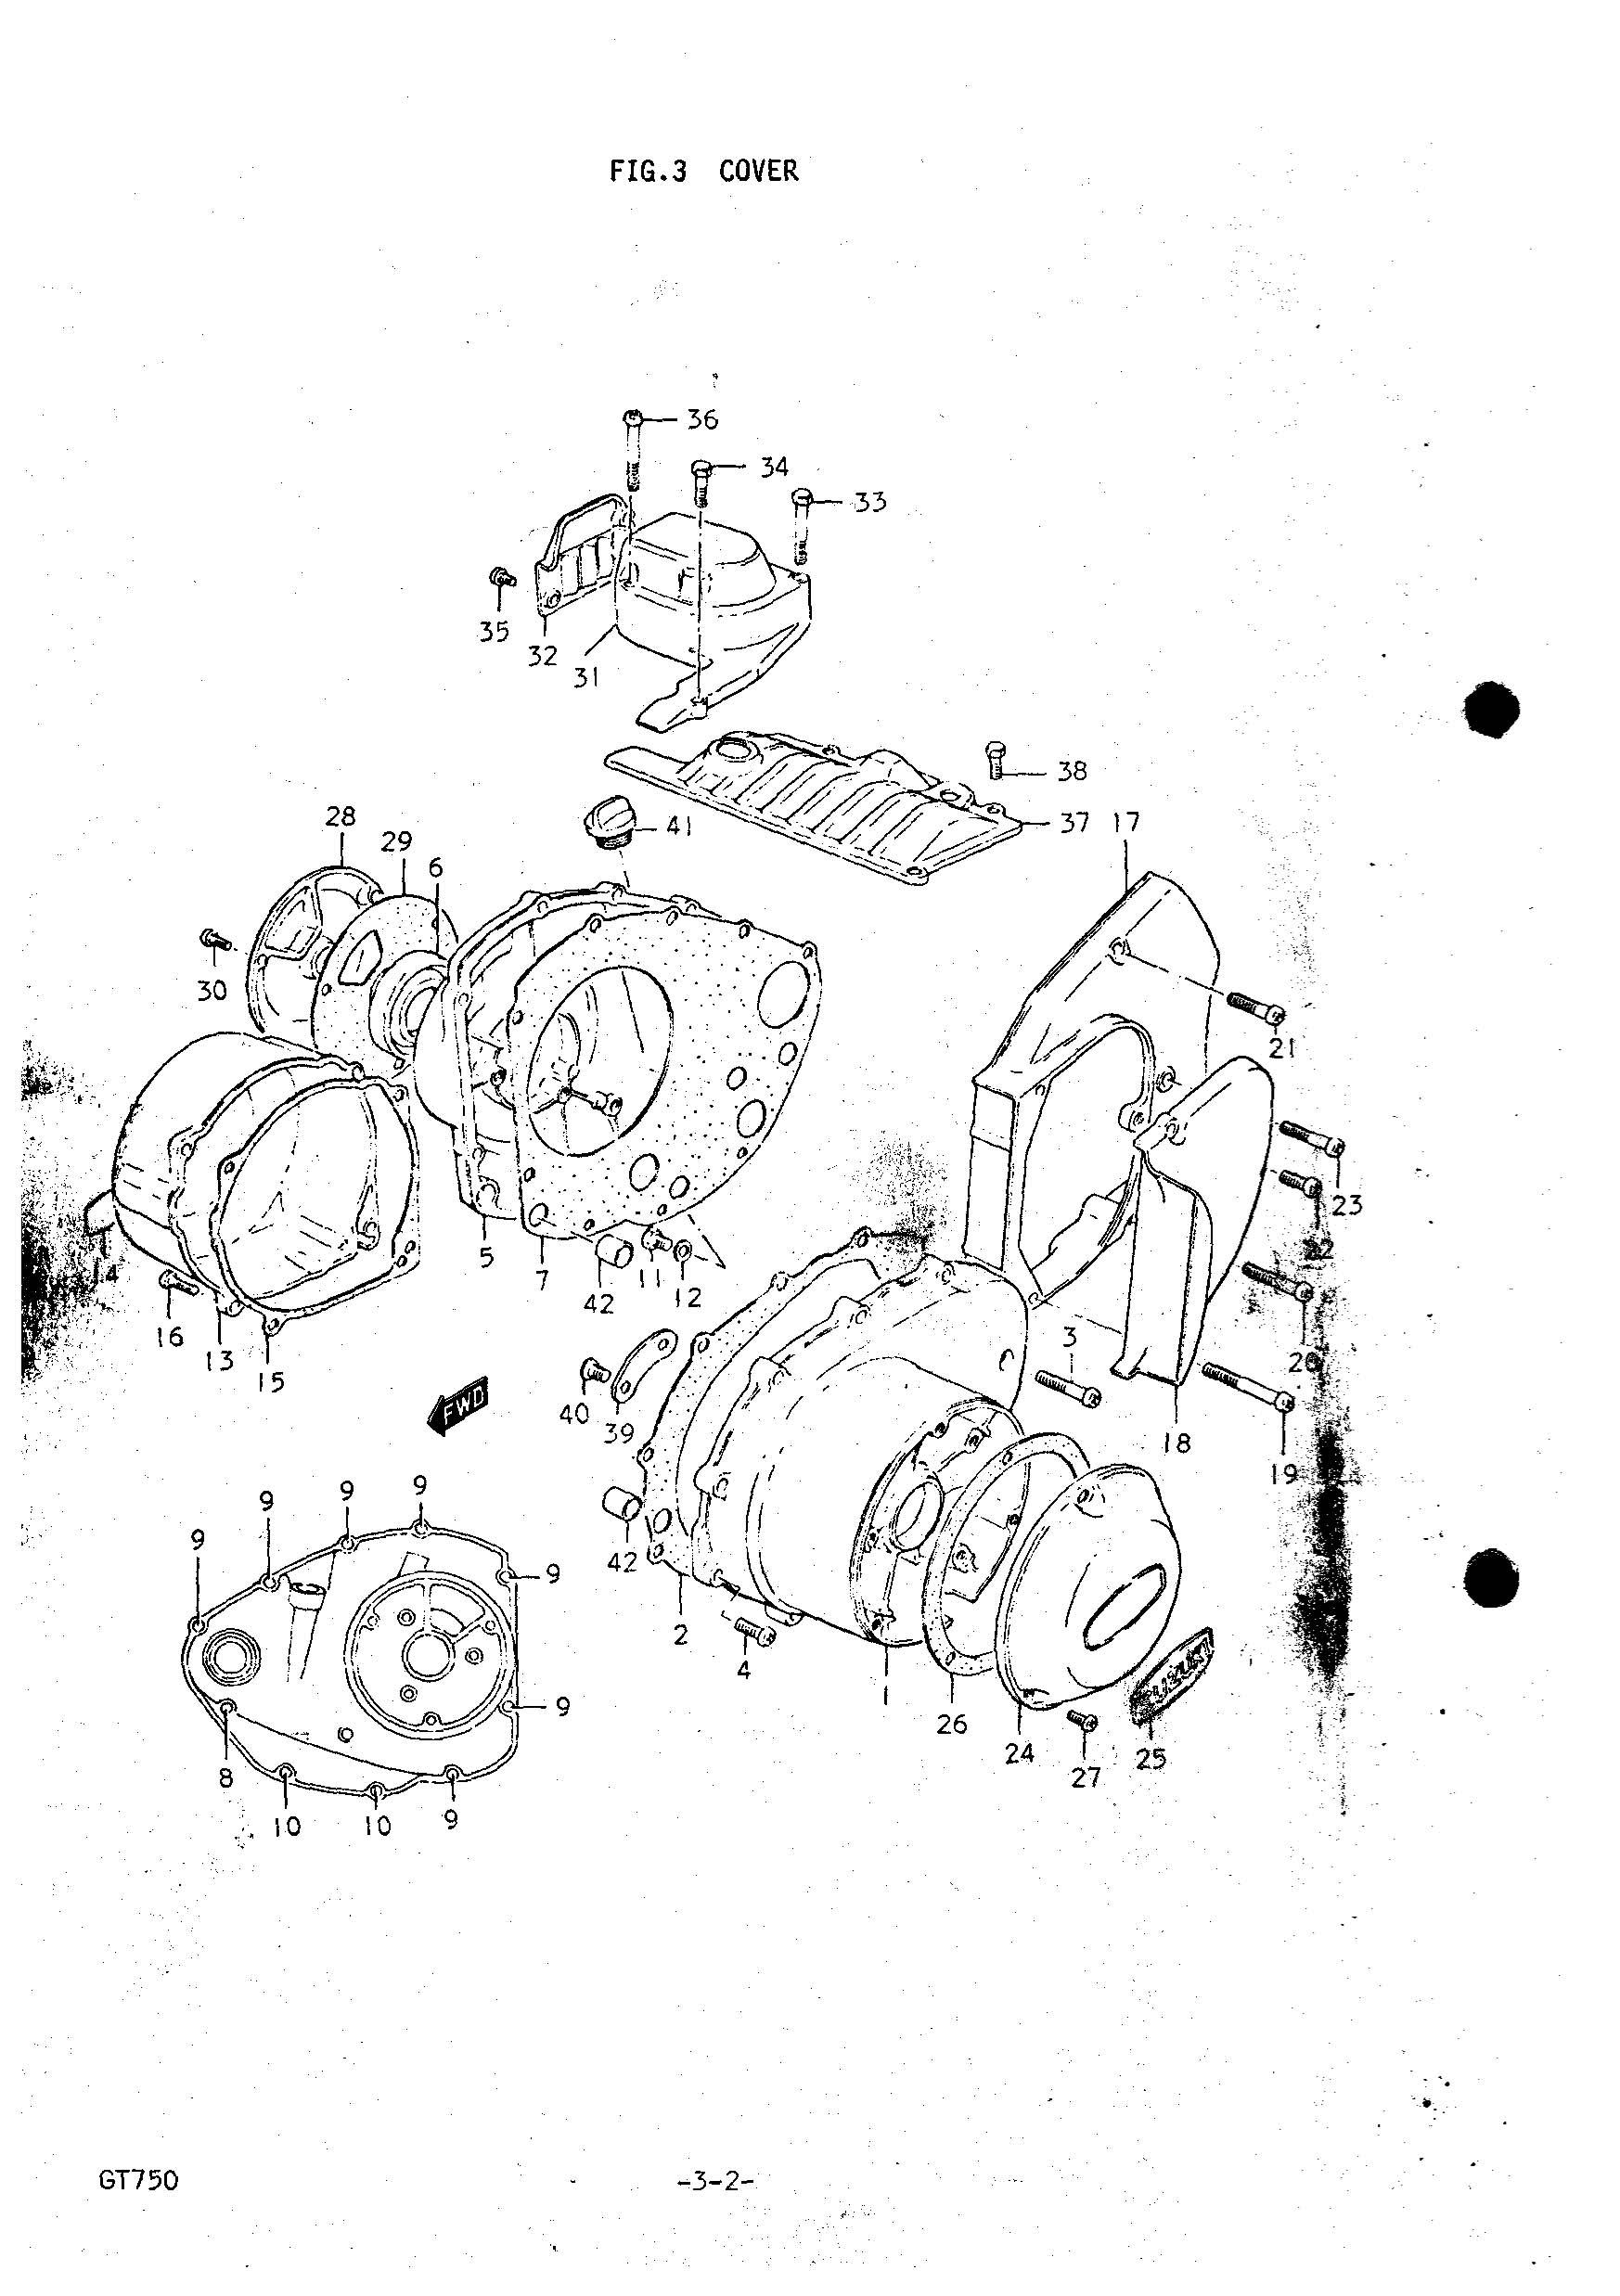 Genuine Suzuki GT750 J-M 1972-1975 Cover Oil Level Plug